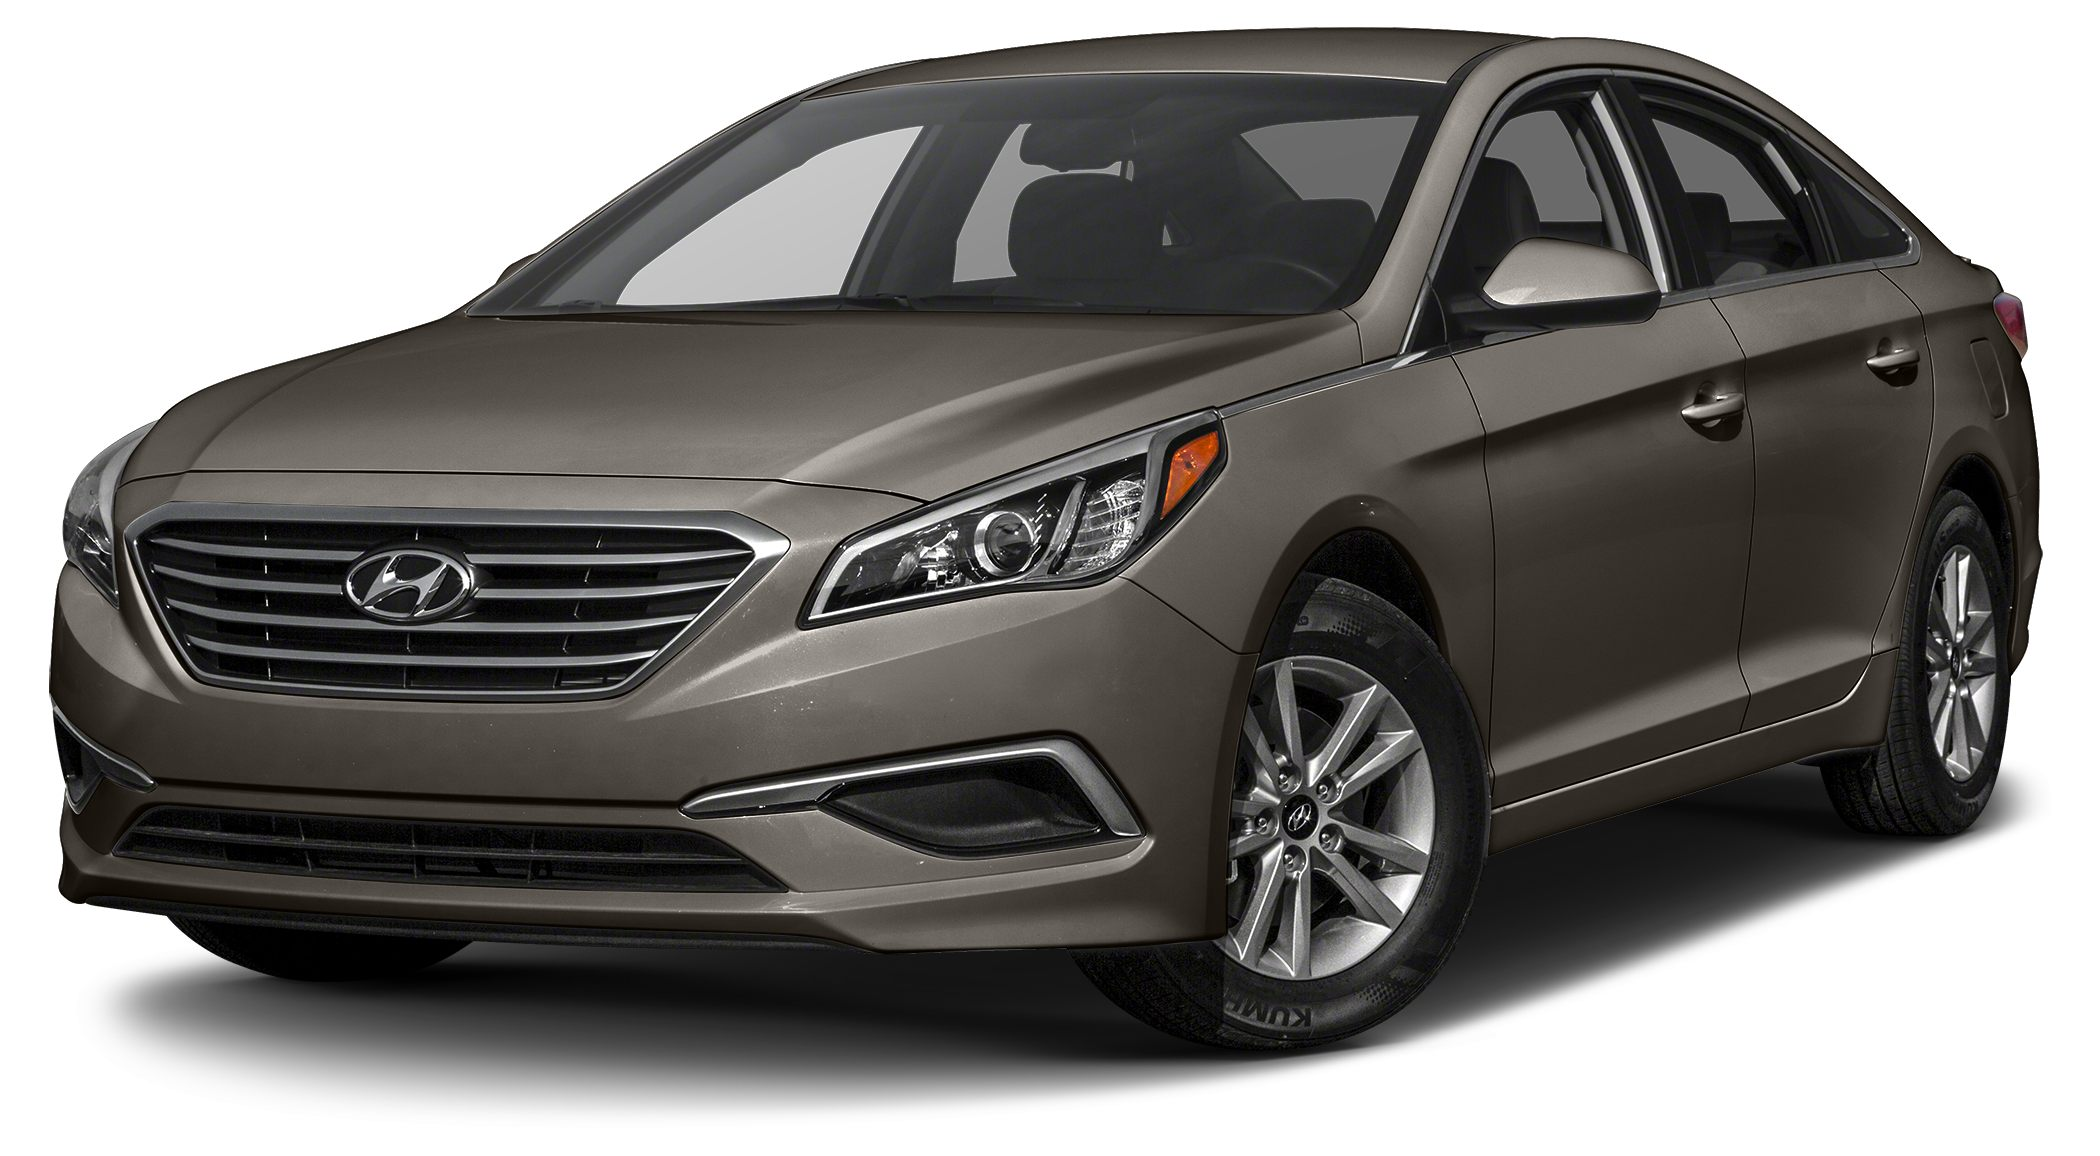 2015 Hyundai Sonata SE Miles 44828Color Dark Truffle Stock K17575A VIN 5NPE24AF2FH182841